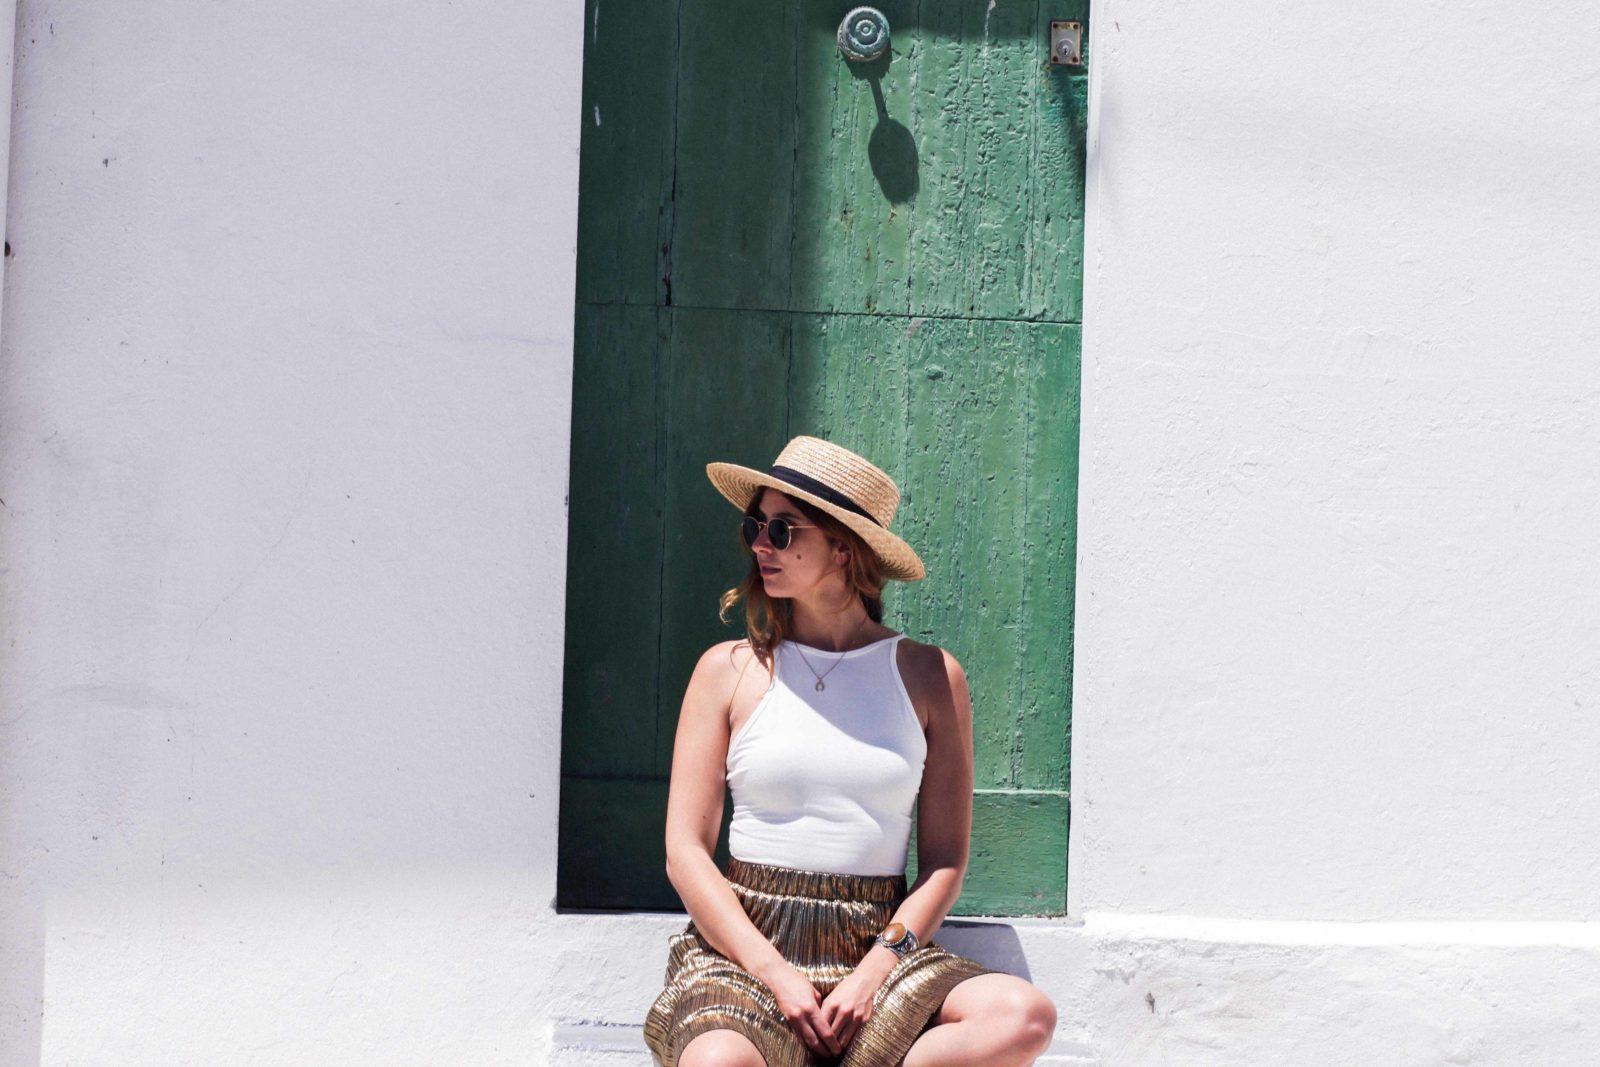 metallics_skirt_falda_dorada_herradura_donkeycool_ardentia_canotier-24